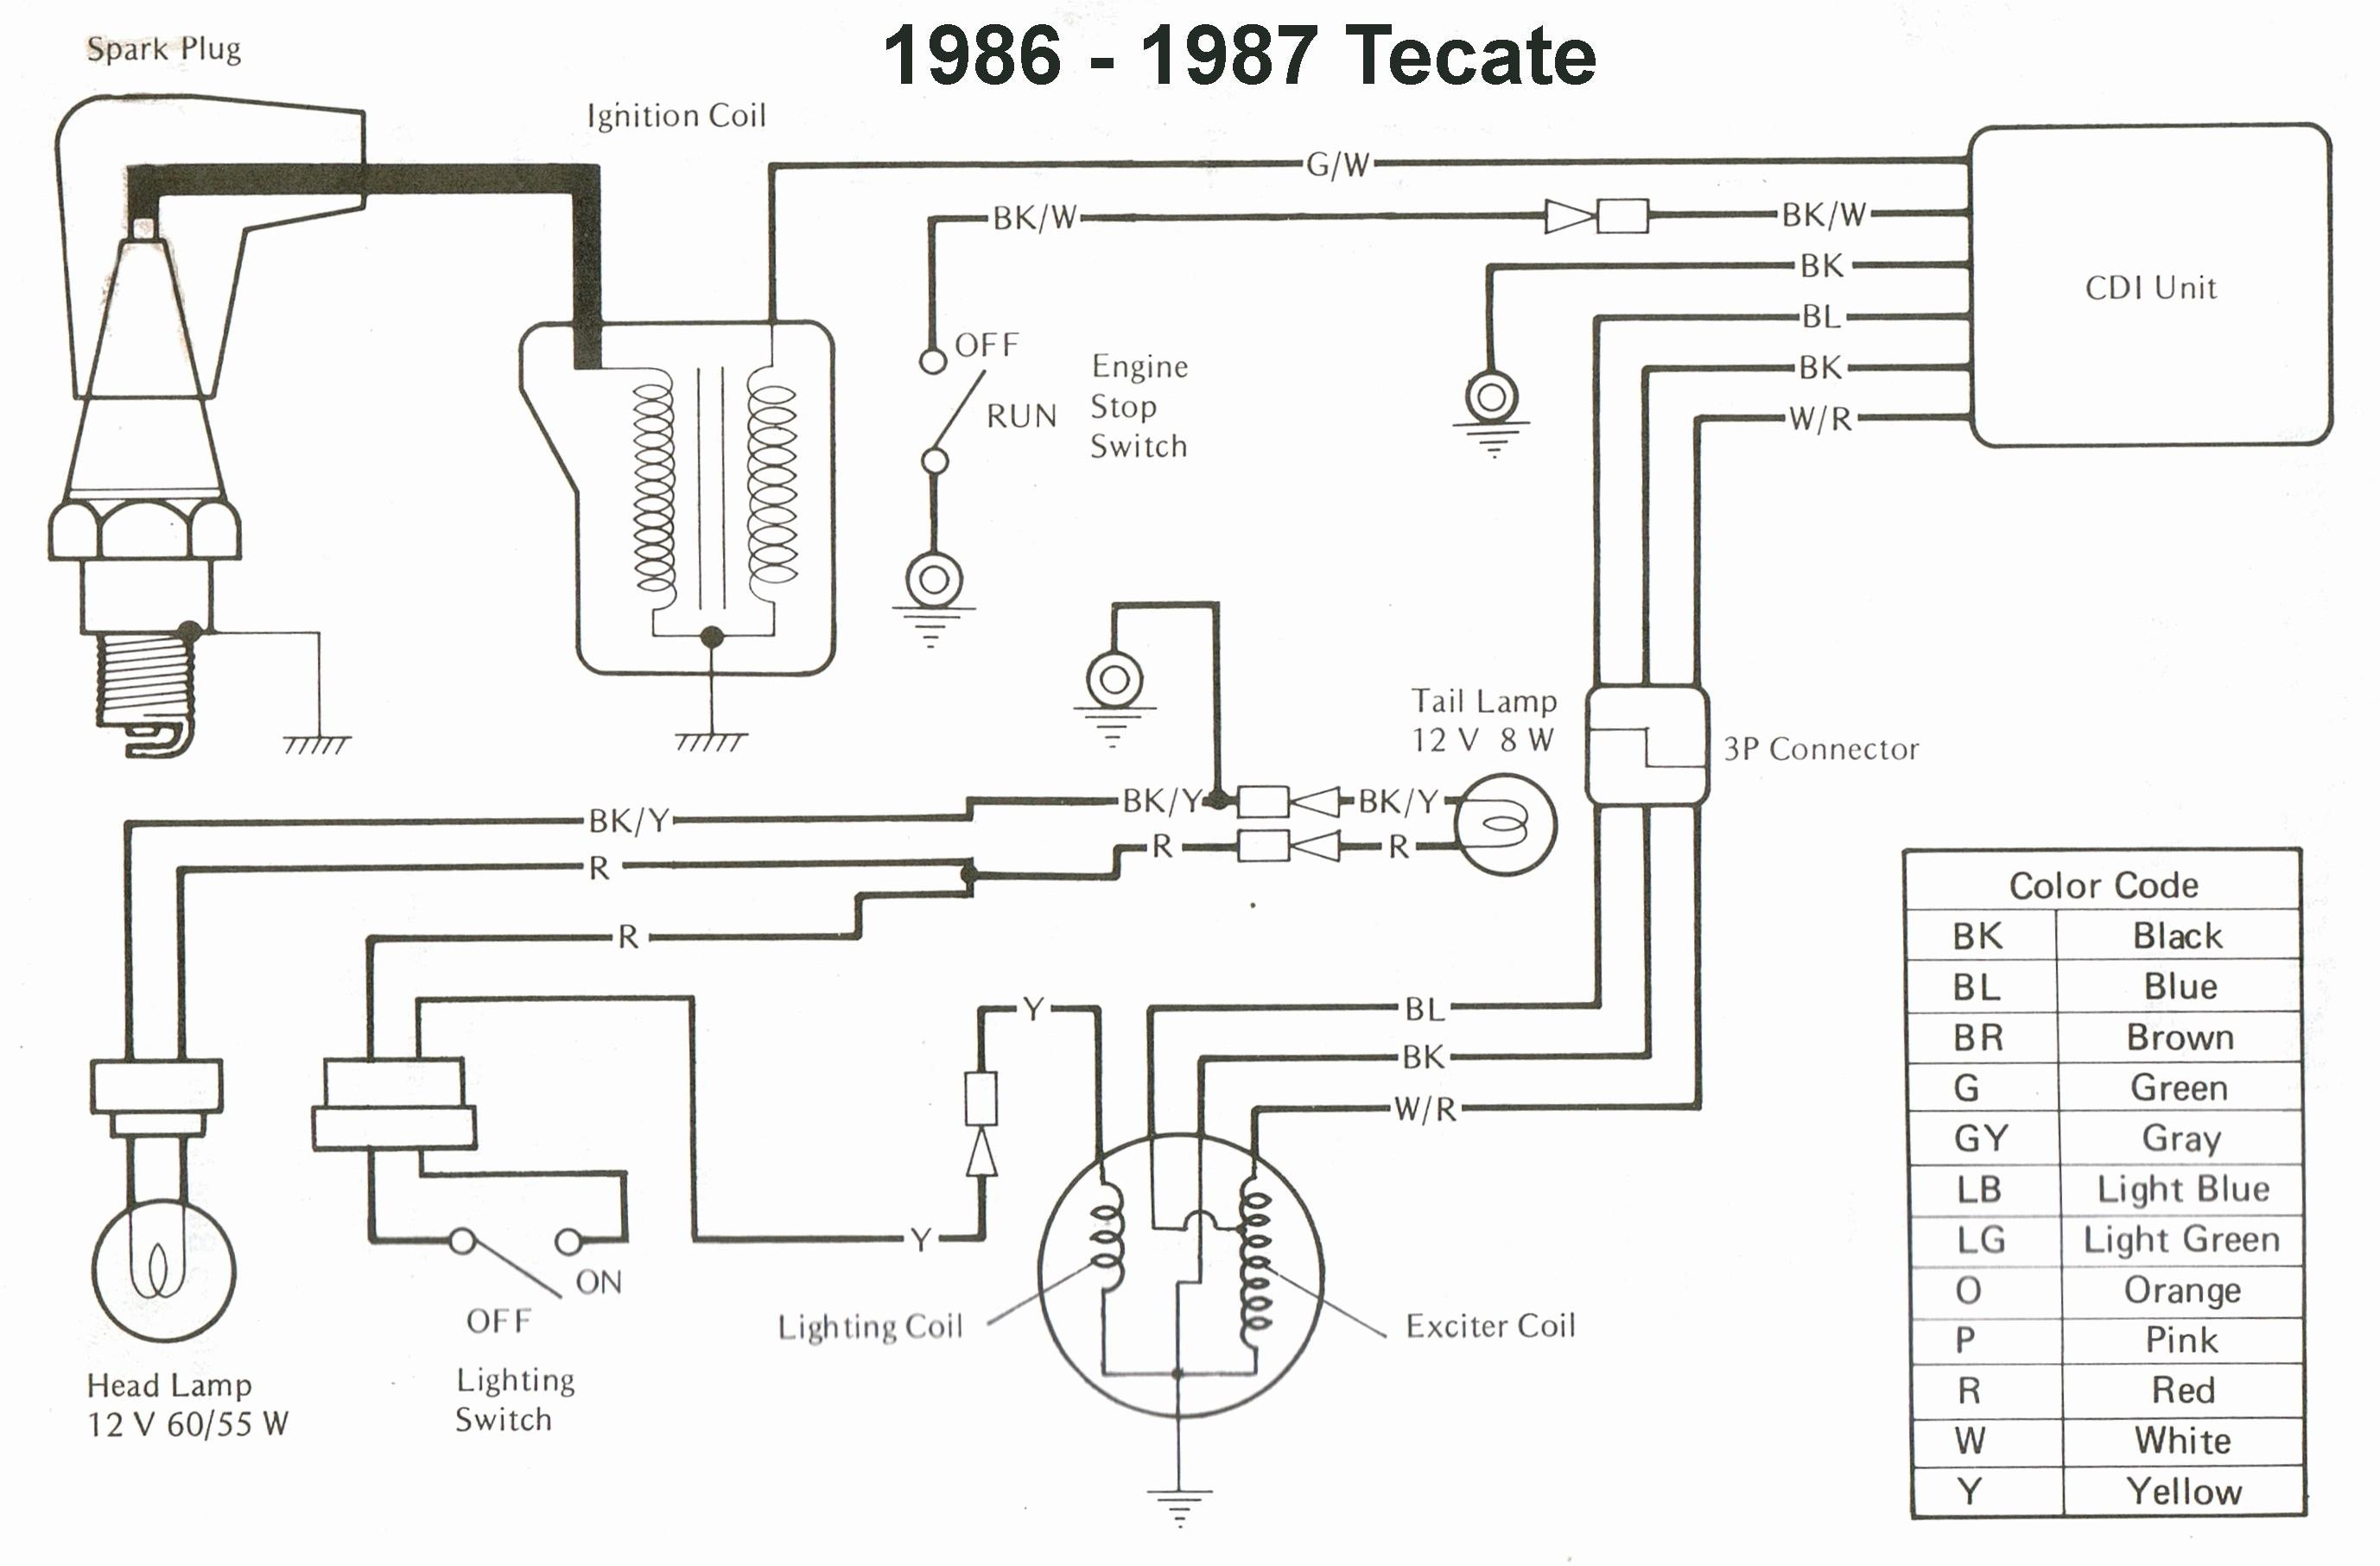 Wiring Diagram Replace Generator With Alternator 2 Robin New - Wiring Diagram Replace Generator With Alternator